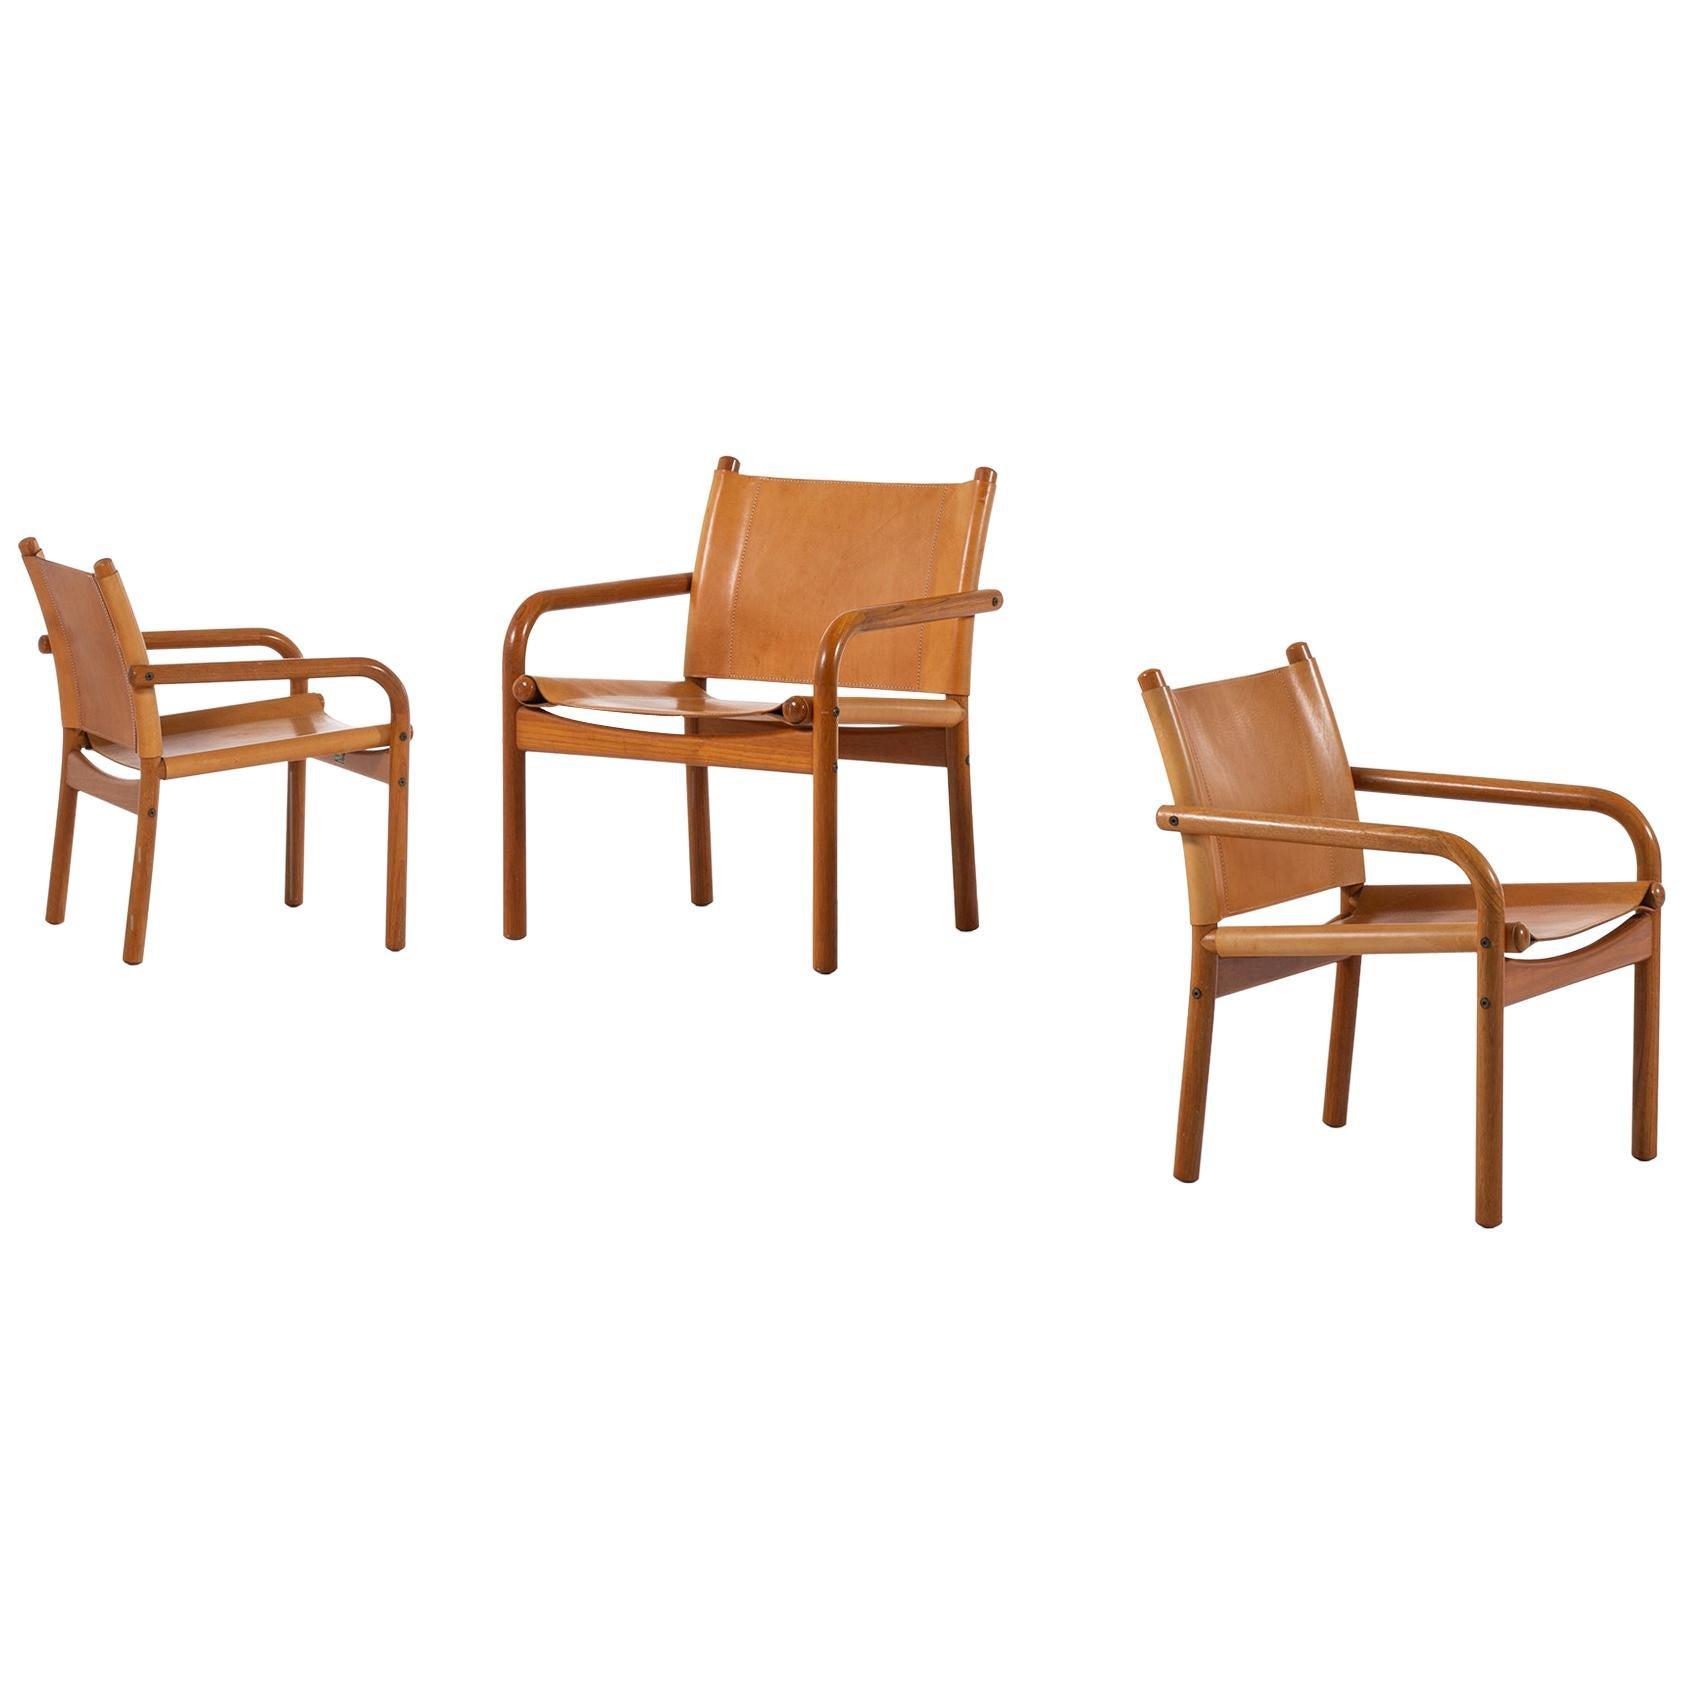 Easy Chairs Produced by Bernstorffsminde Møbelfabrik in Denmark